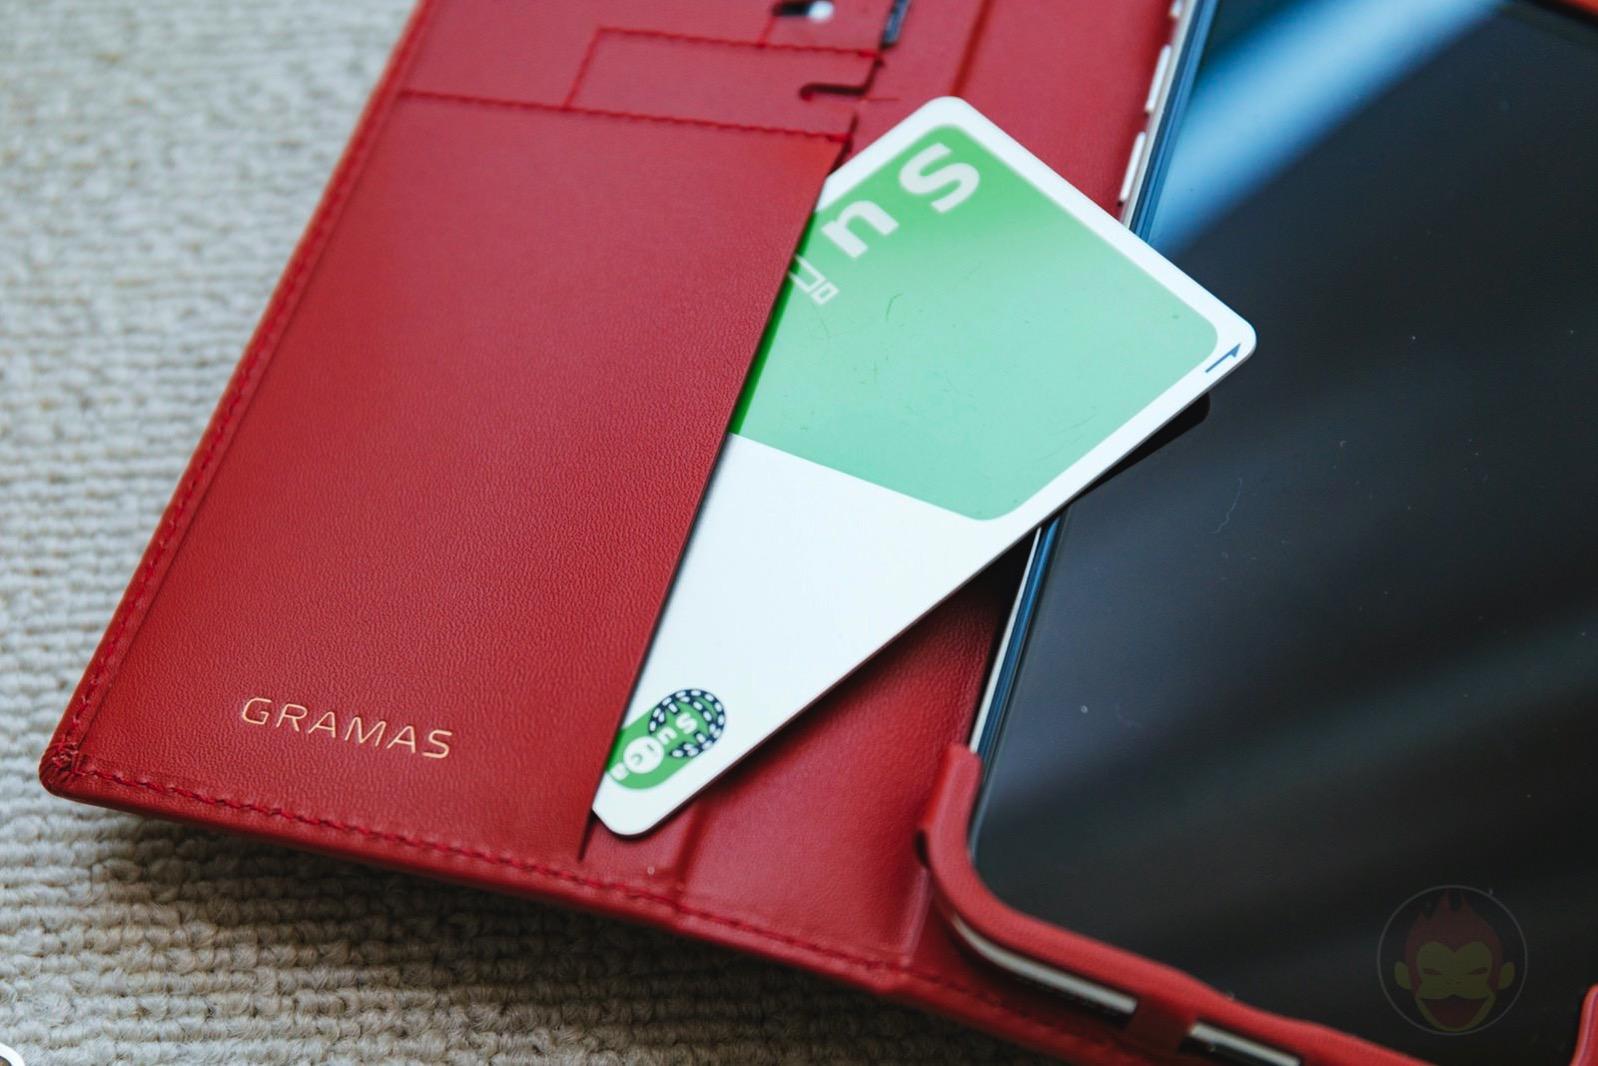 GRAMAS-Full-Leather-Case-Red-for-iPhoneX-SIM-PIN-15.jpg